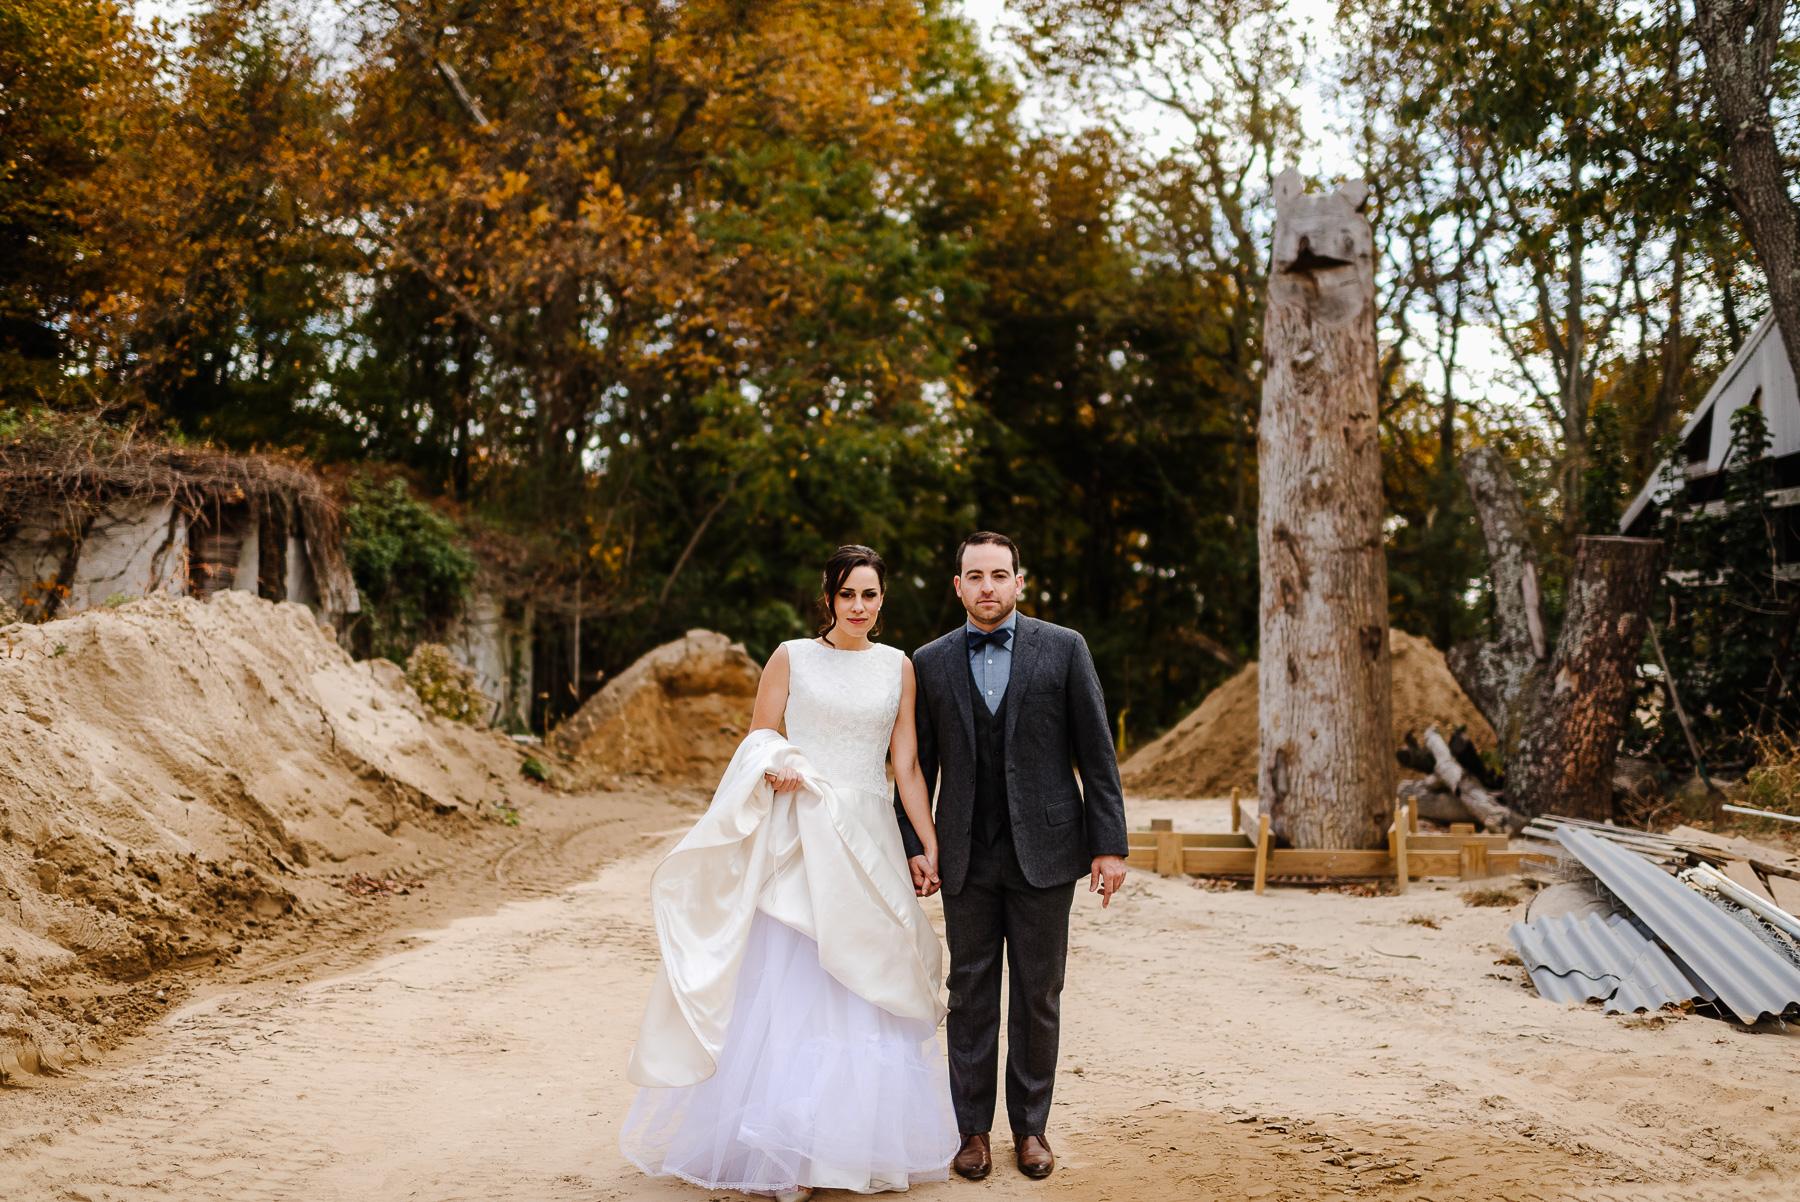 47-Laurita Winery Wedding New Jersey Wedding Photographer Laurita Winery Weddings Longbrook Photography.jpg